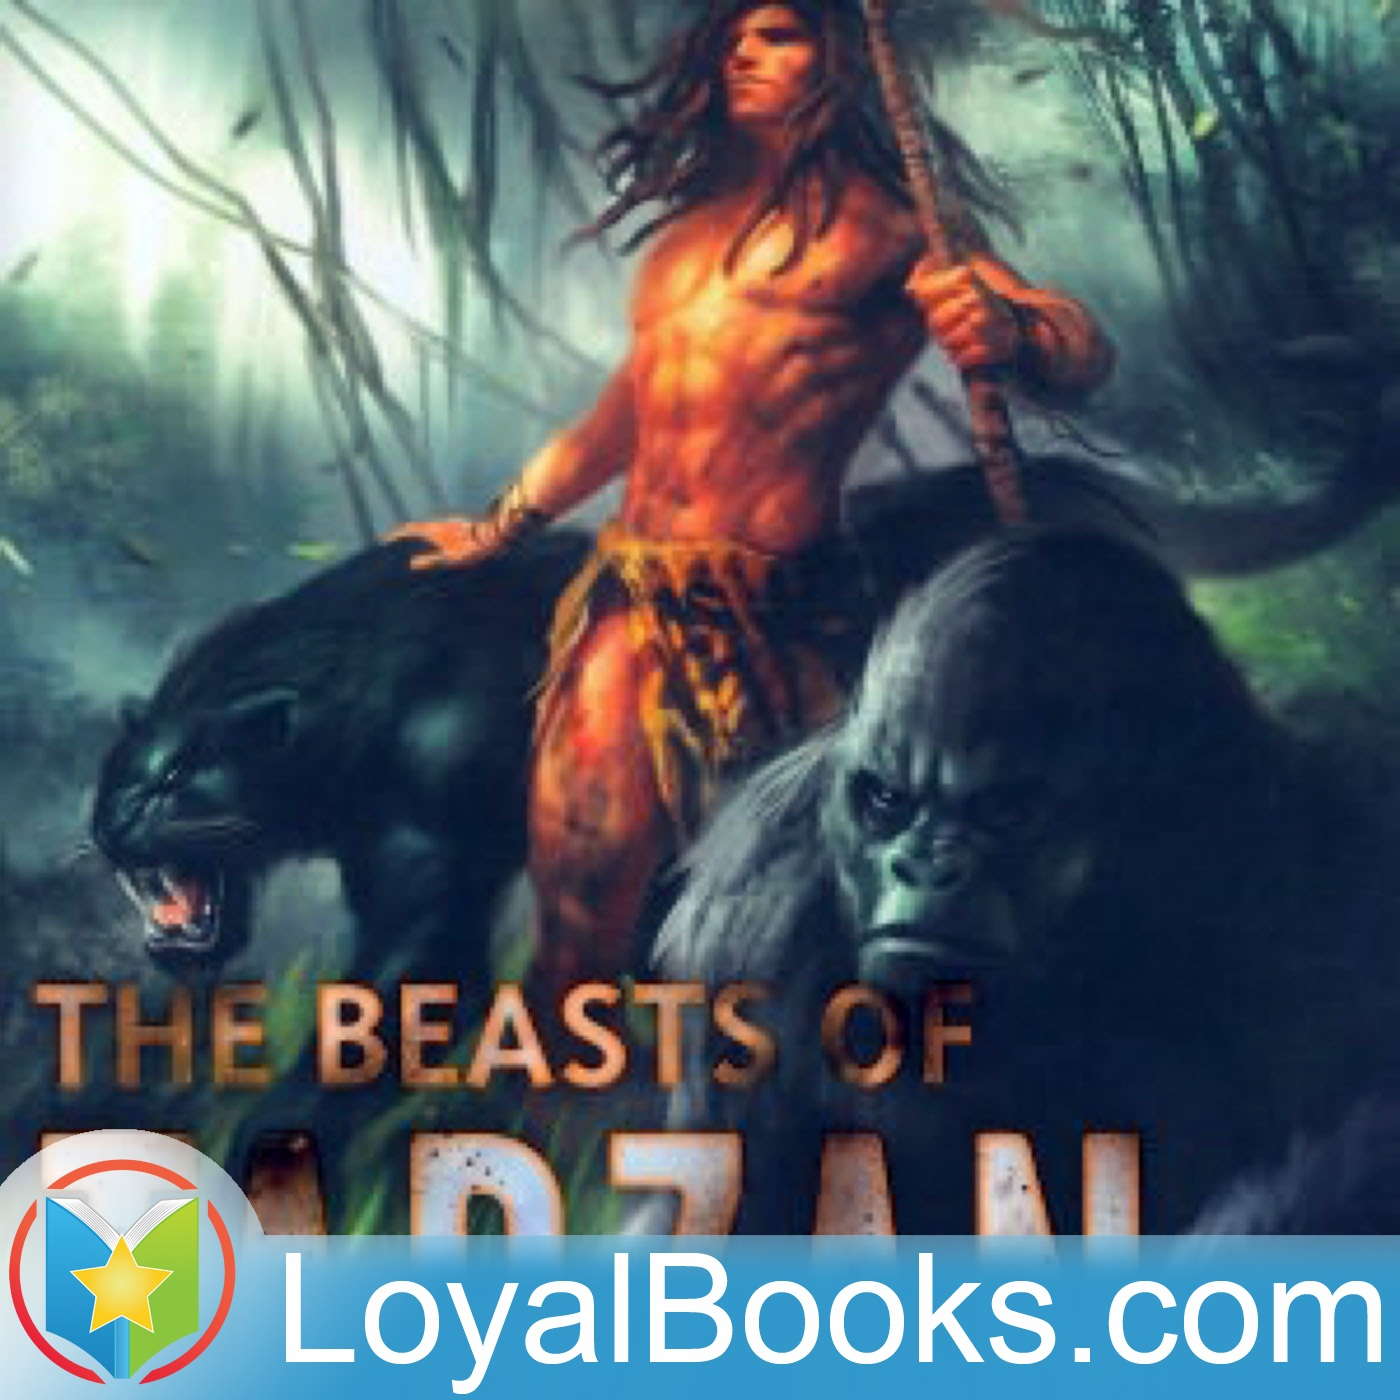 <![CDATA[The Beasts of Tarzan by Edgar Rice Burroughs]]>